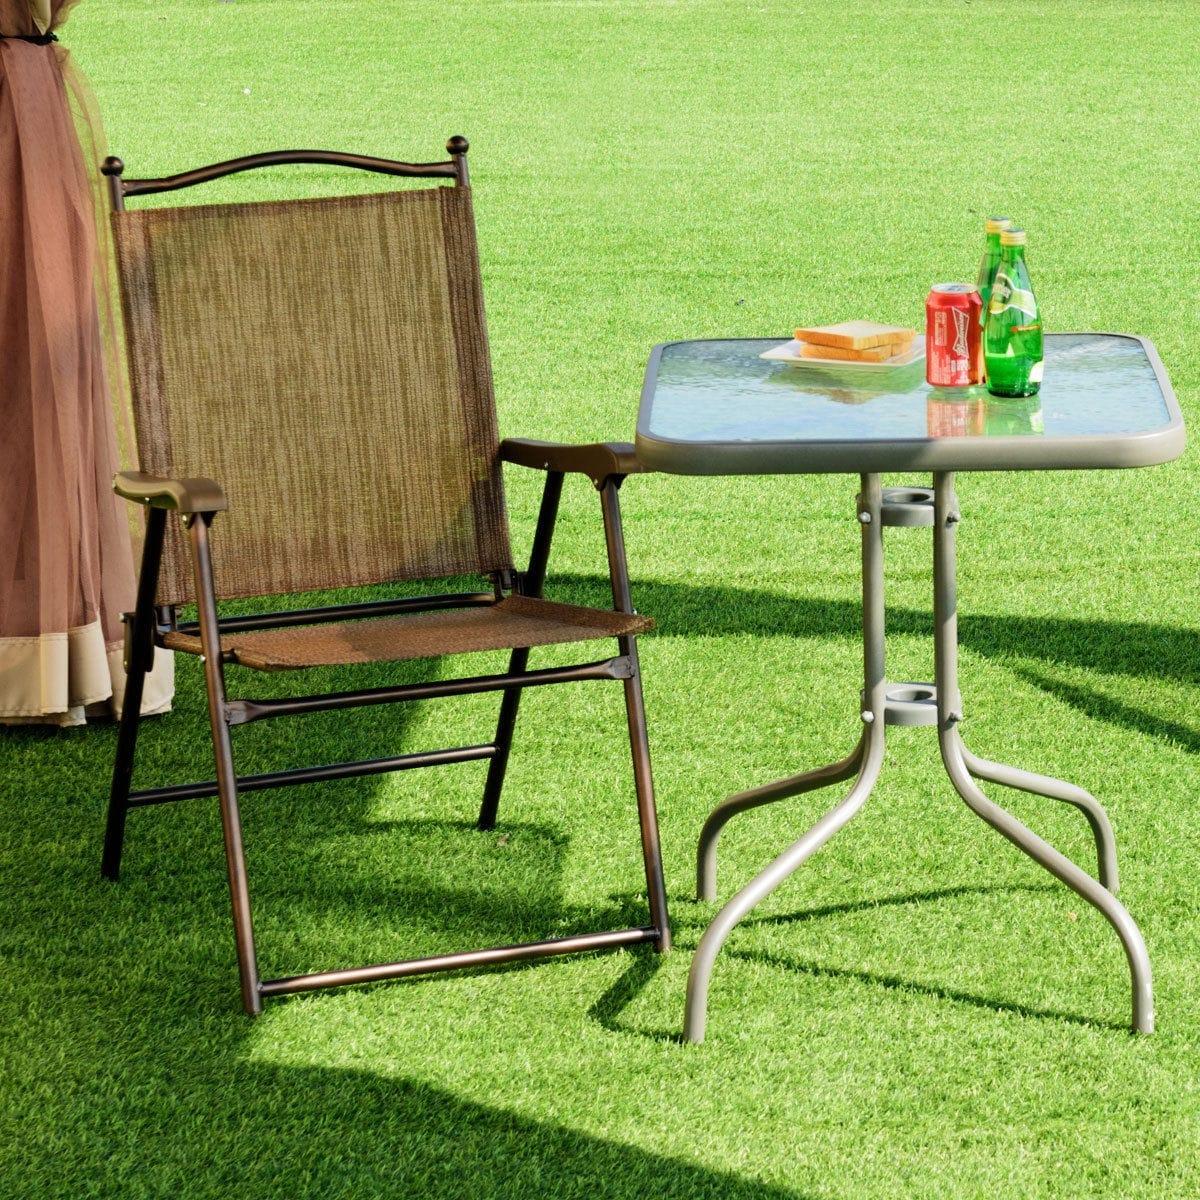 Folding Patio Chair Set Outdoor Furniture Pool Deck Lawn Garden Yard Porch Brown